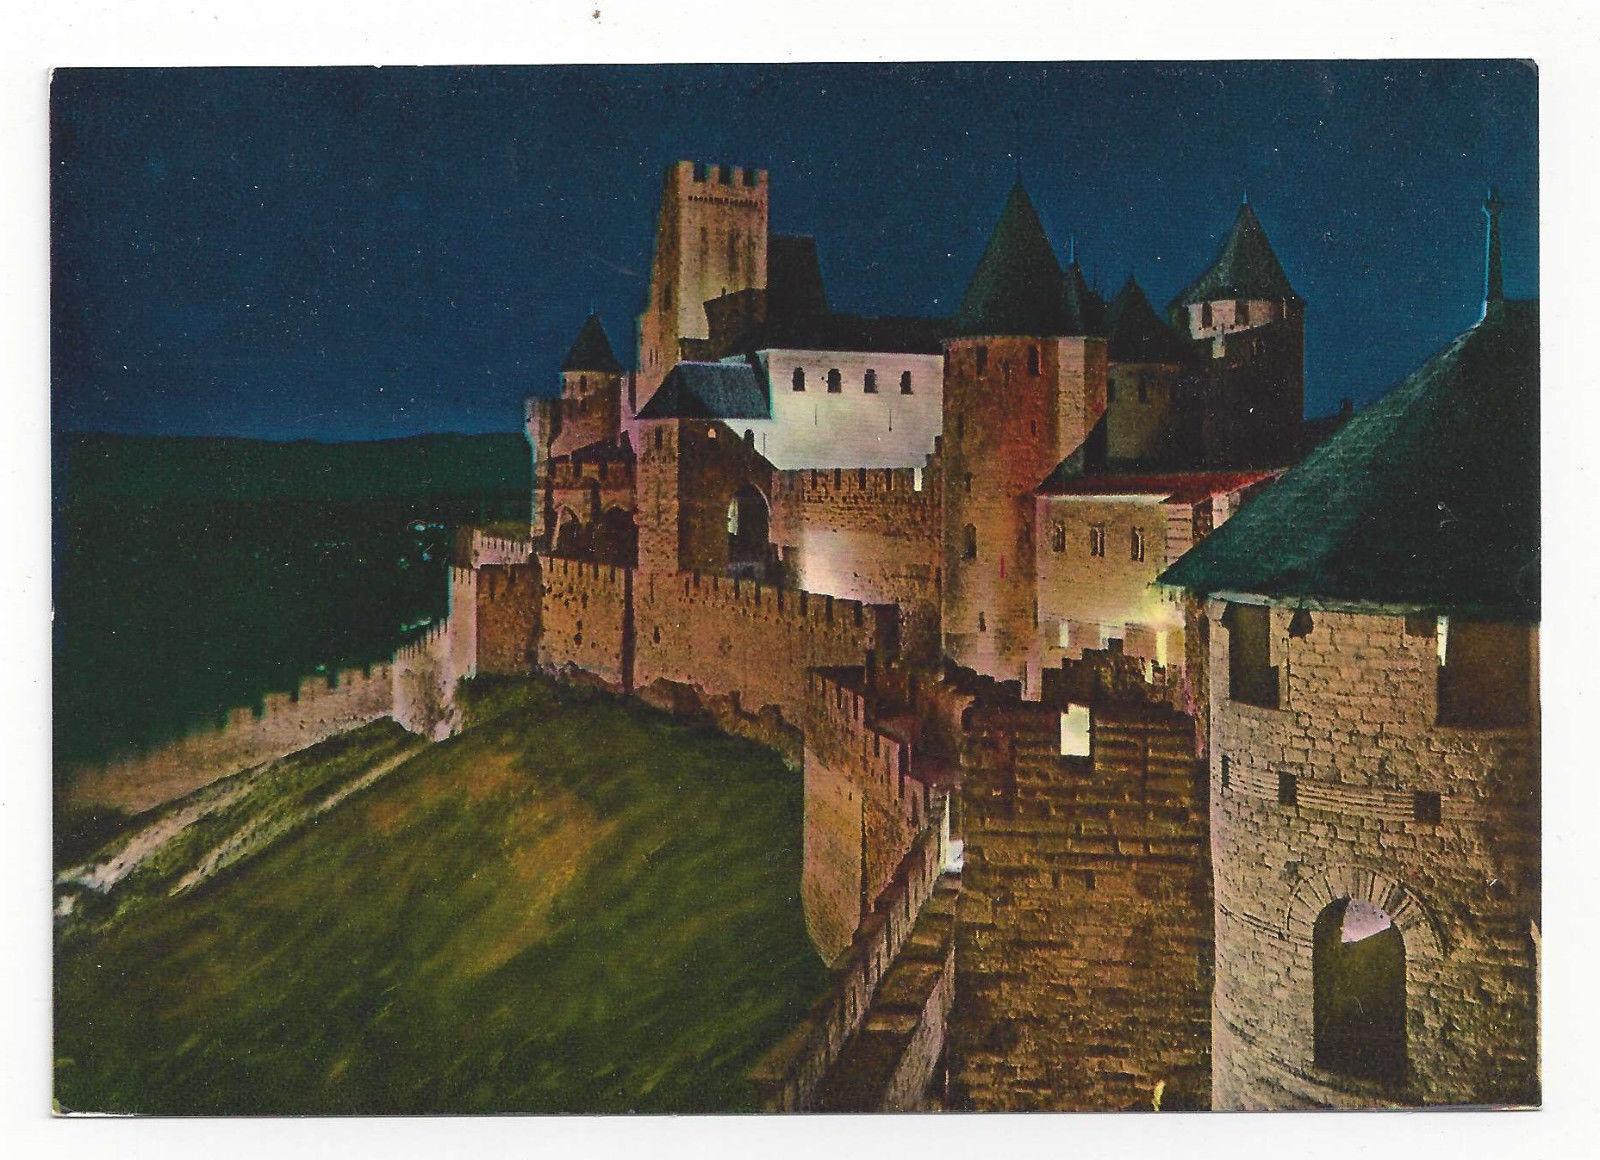 France Cite de Carcassonne Chateau Comtal Fort Citadel Night Vtg Postcard 4X6